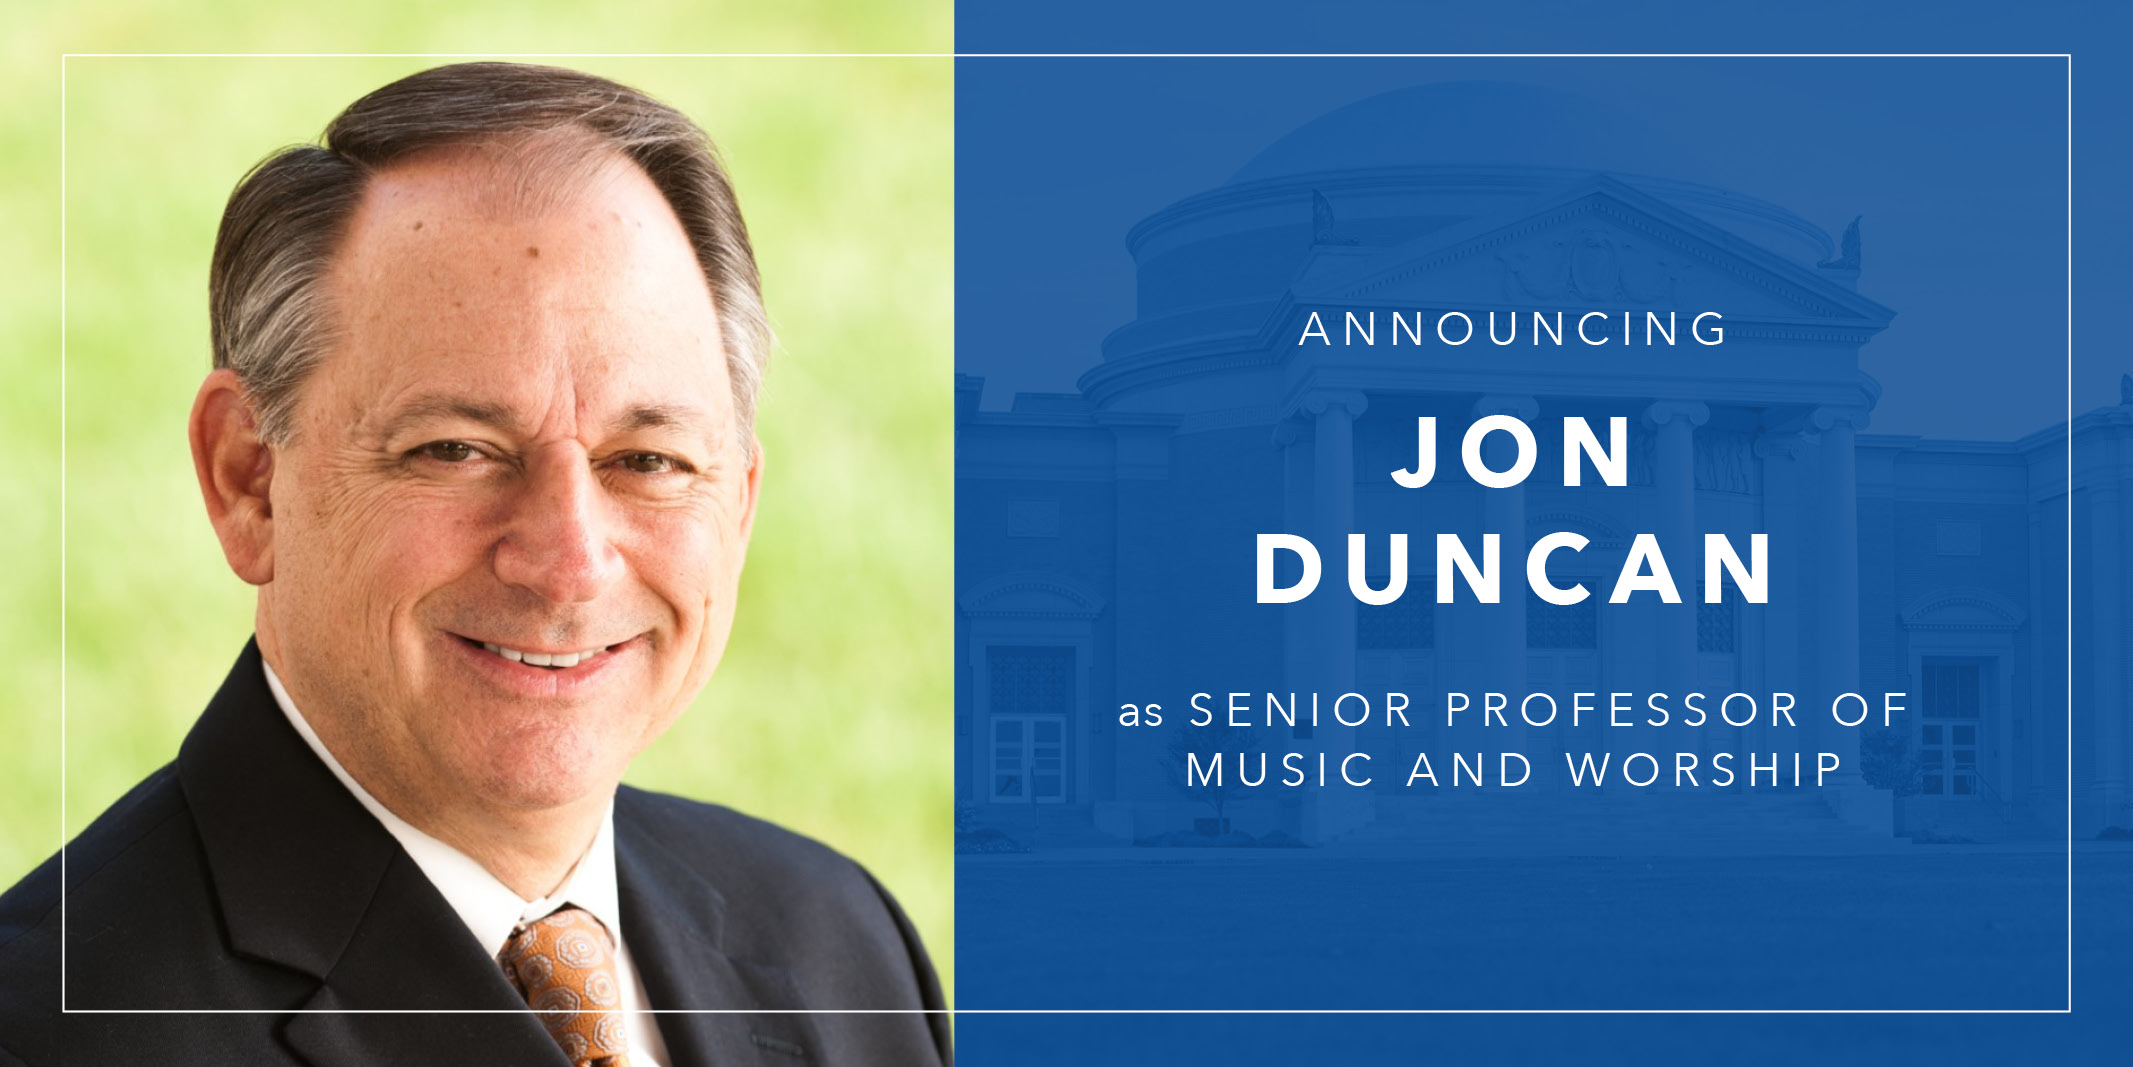 Longtime music ministry leader Jon Duncan joins Southwestern Seminary faculty